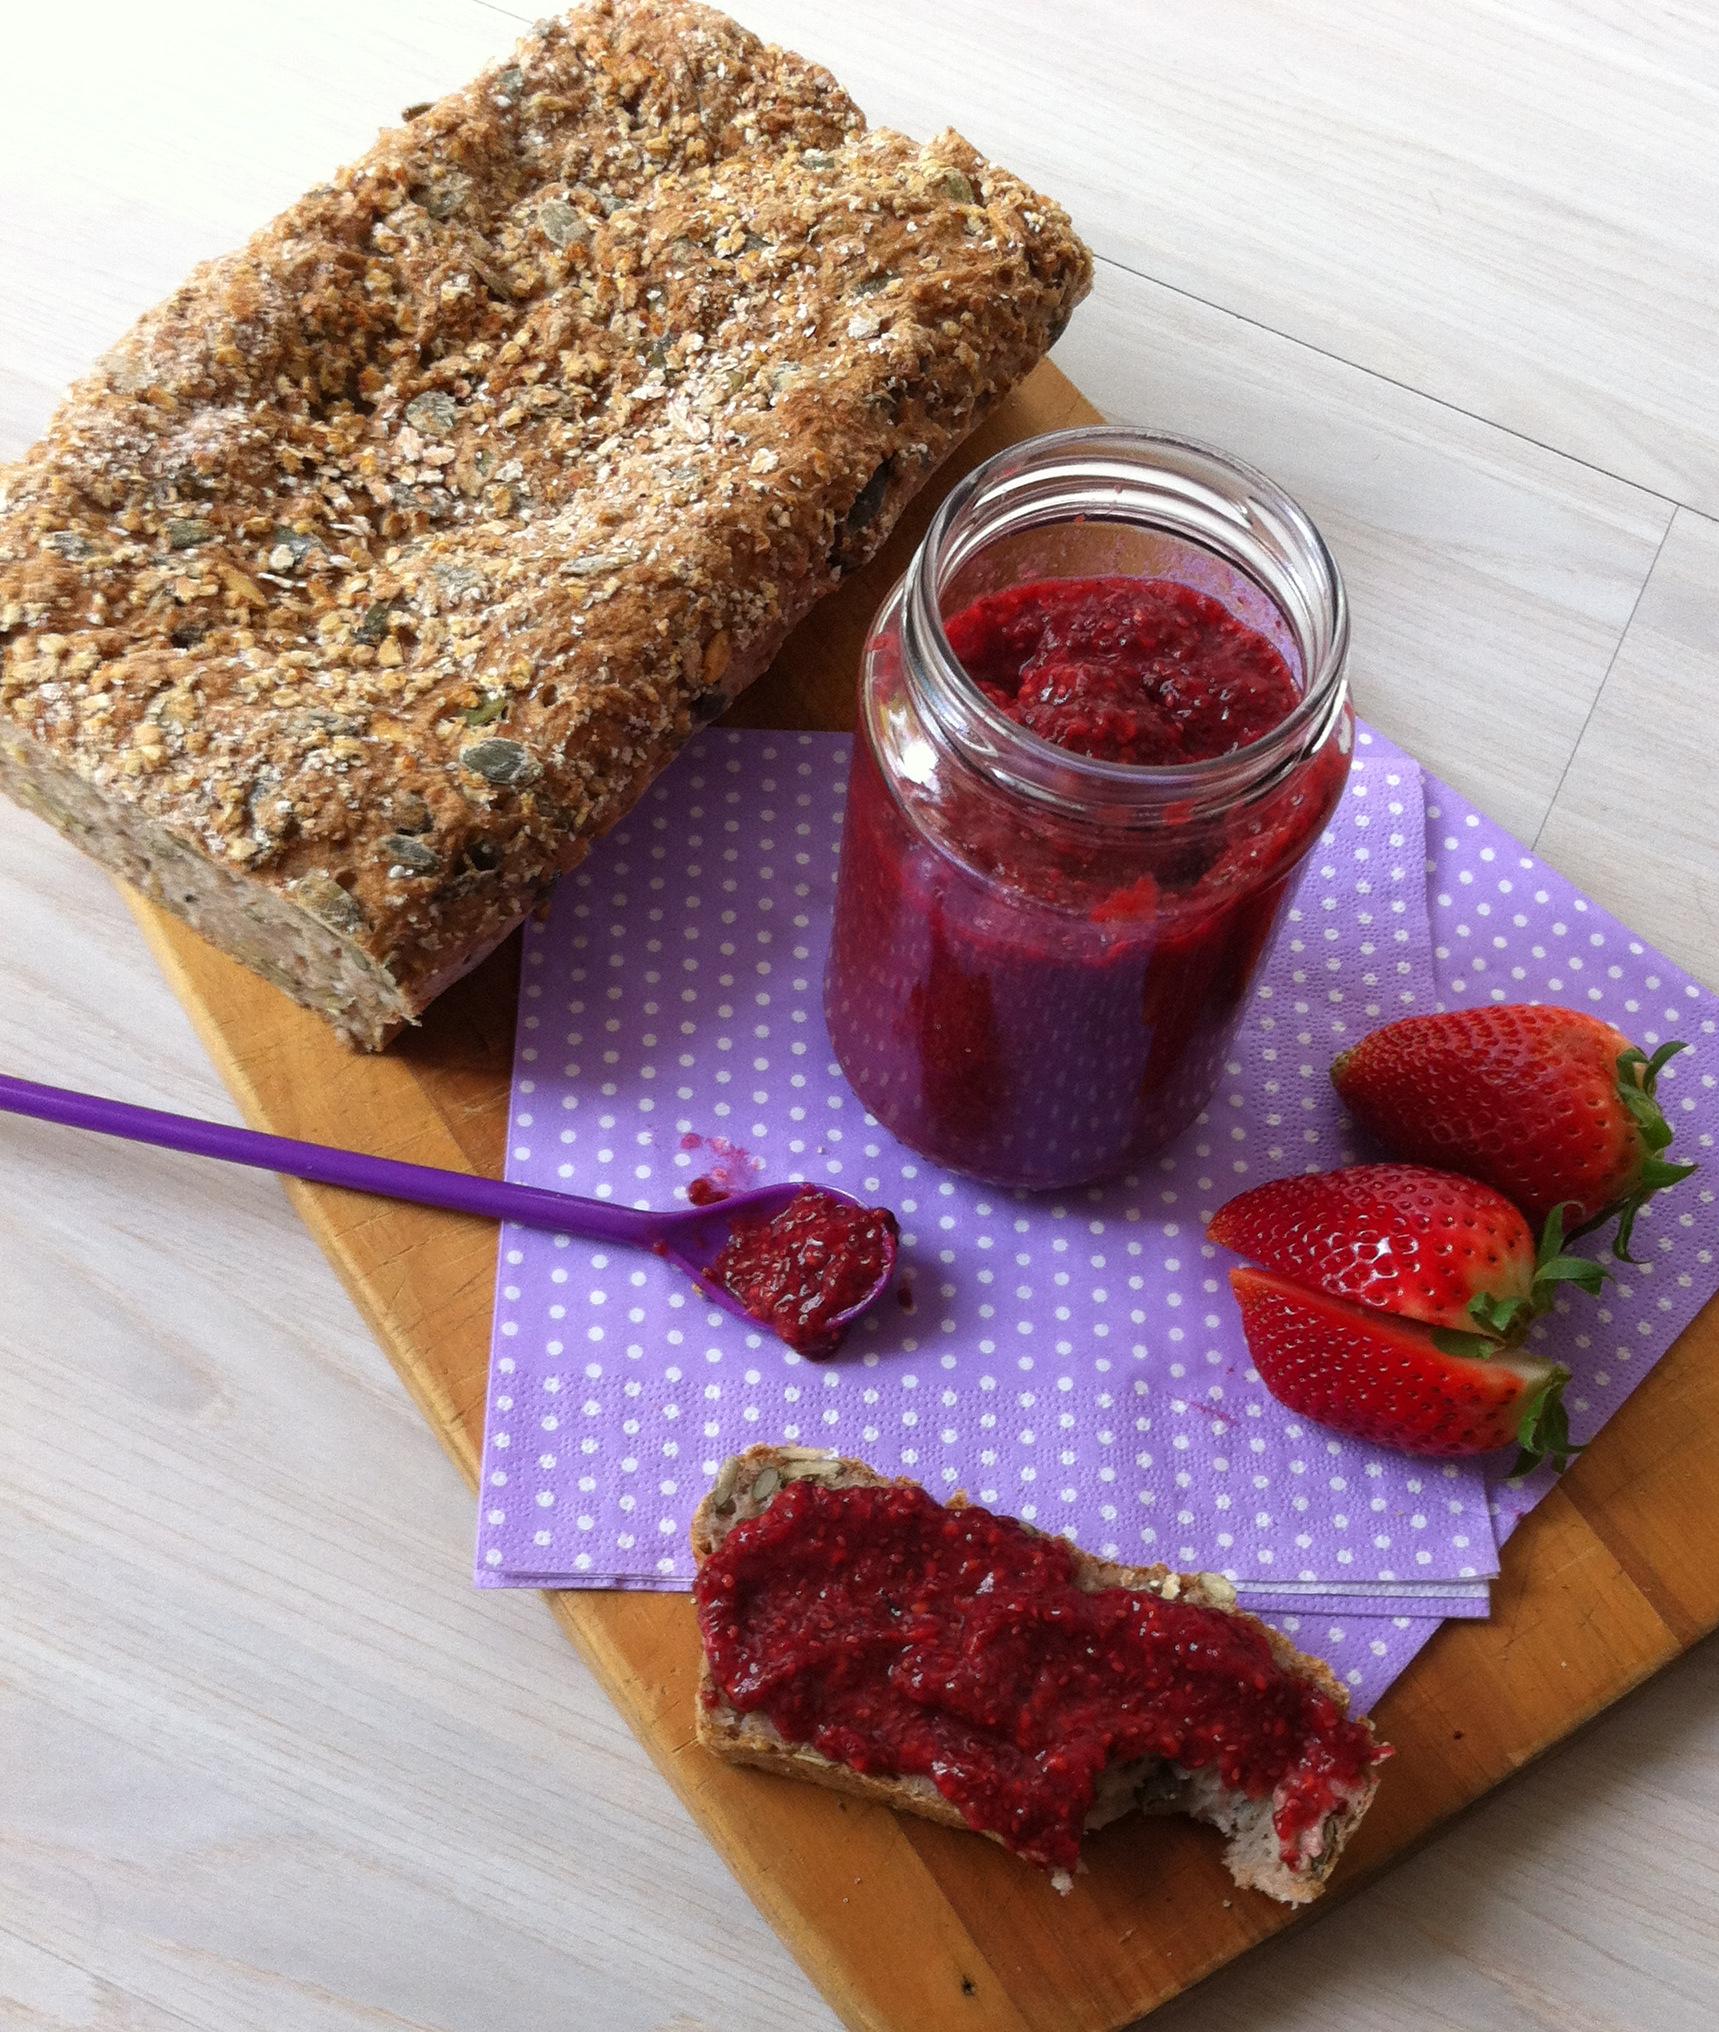 Hindbær-/jordbærmarmelade chiafrø sukkerfri